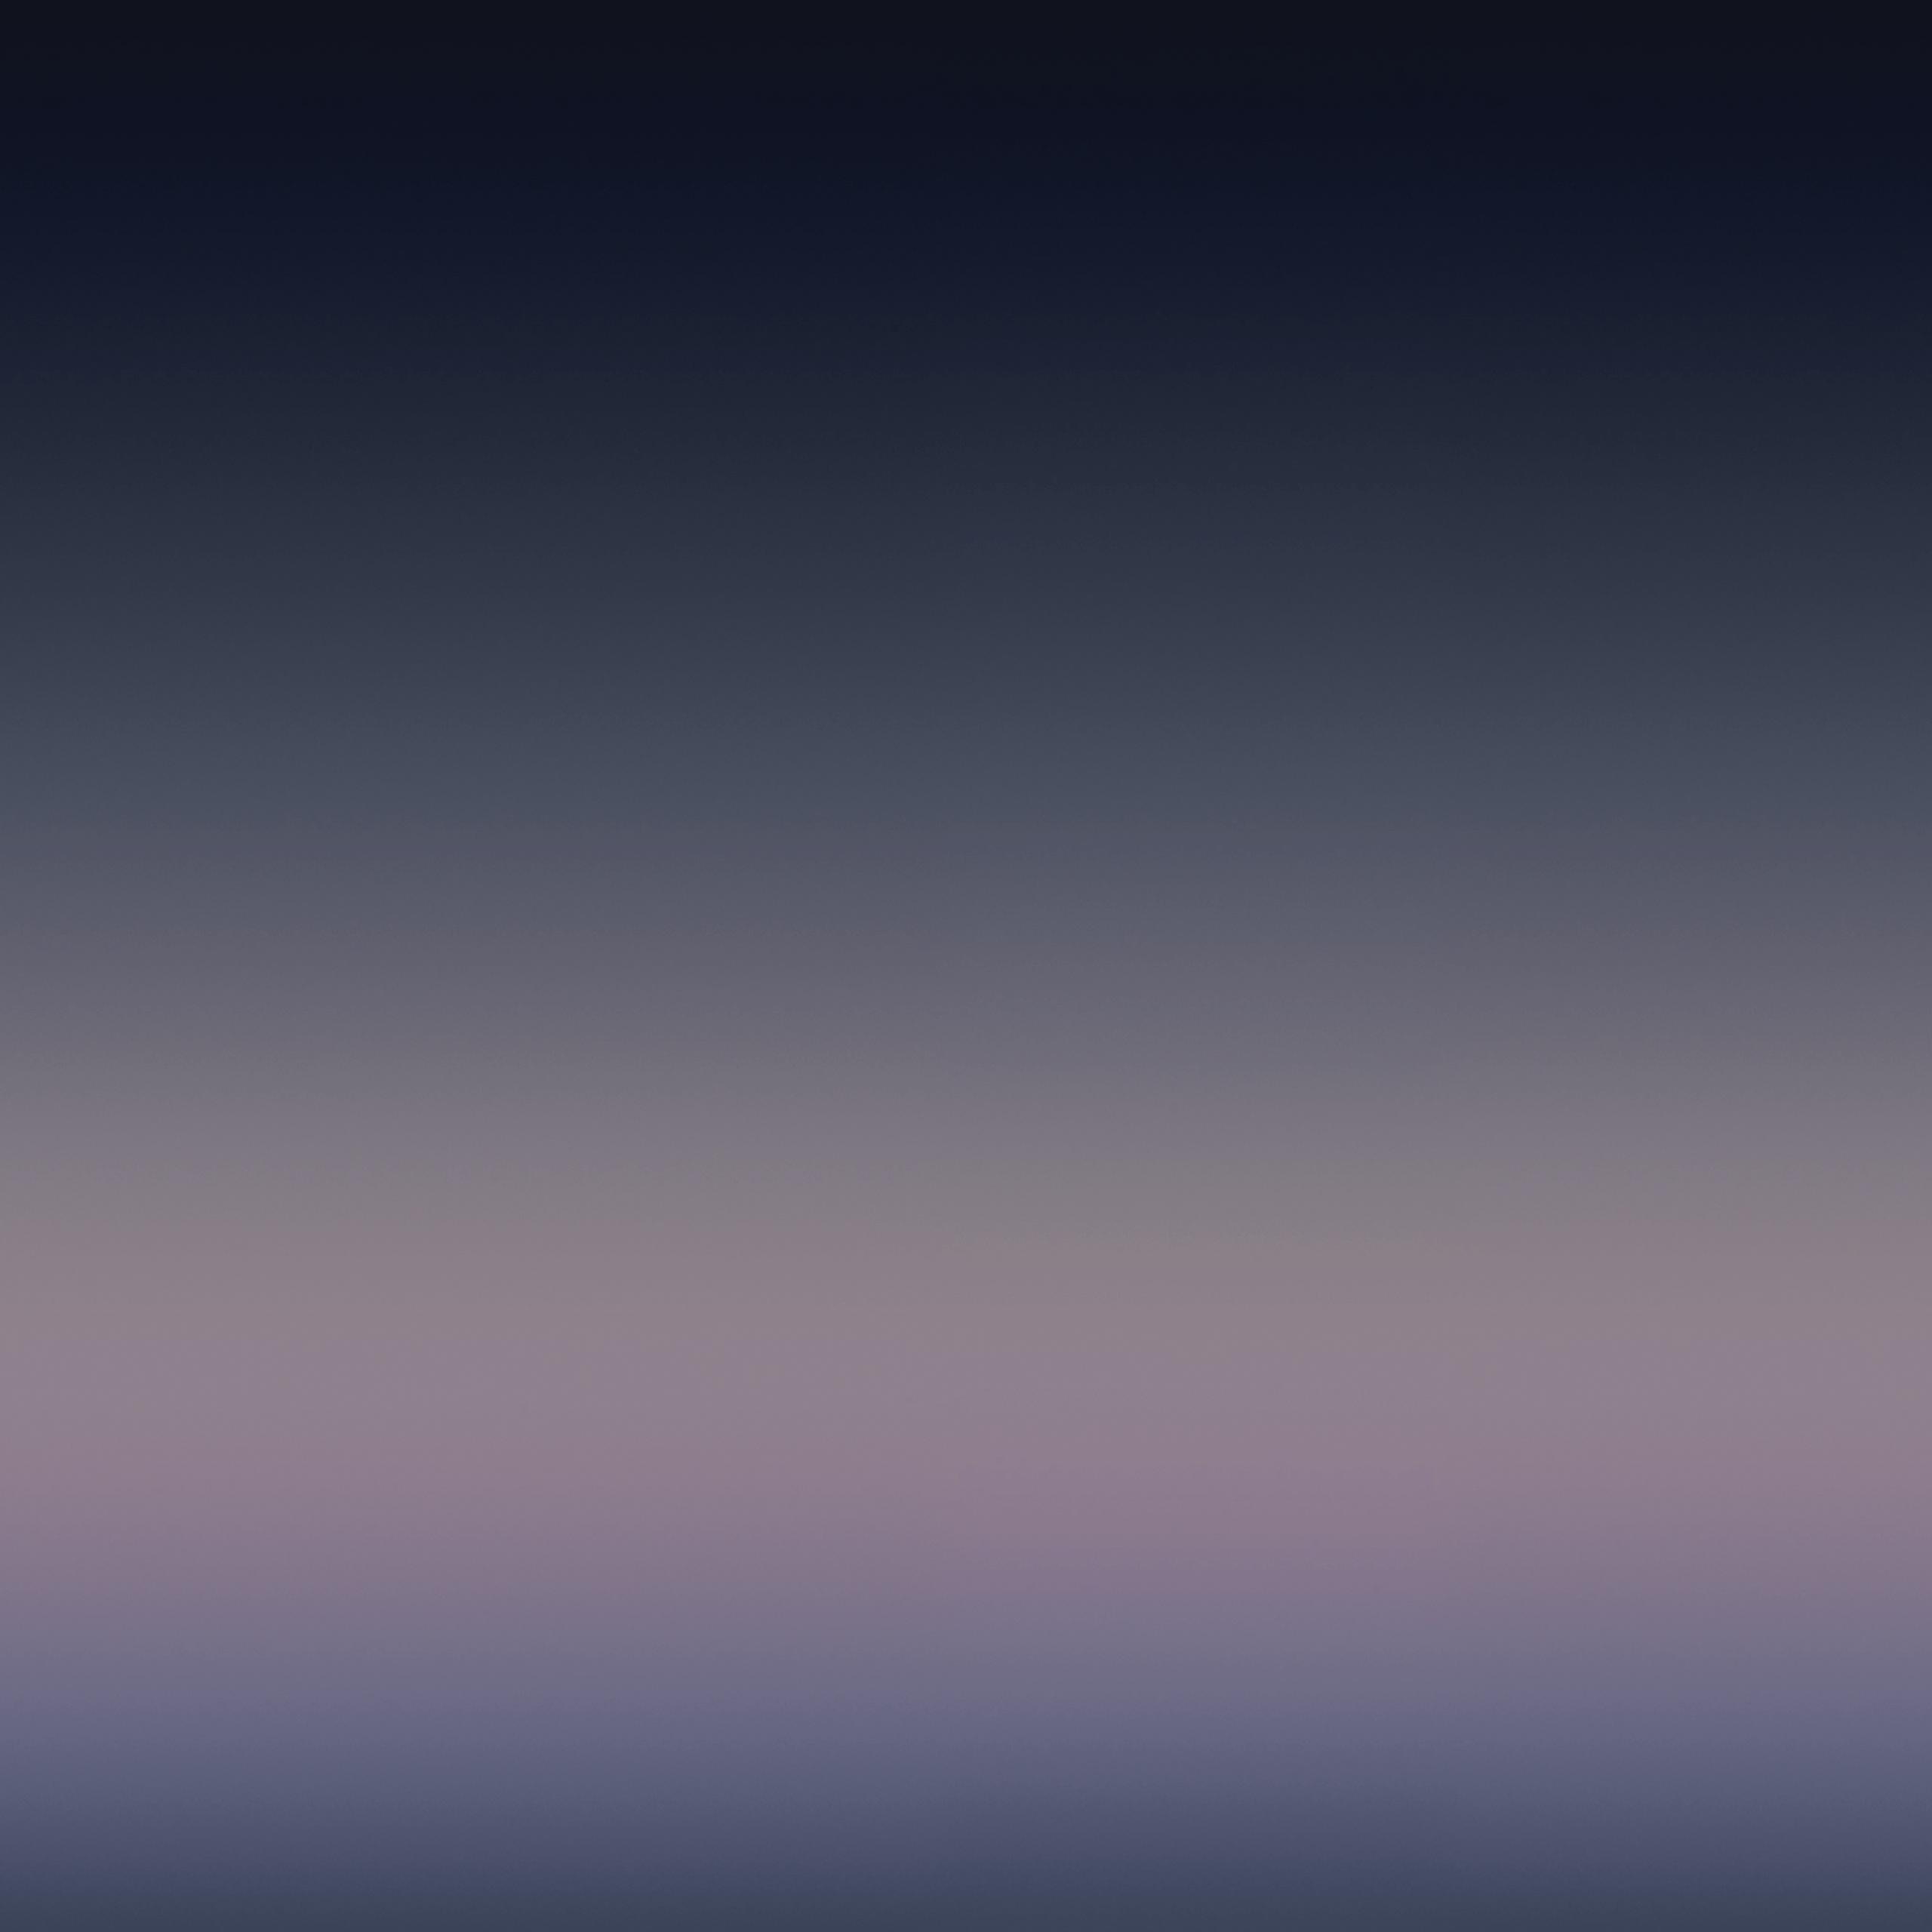 Samsung Galaxy Note 8 Wallpaper 4k